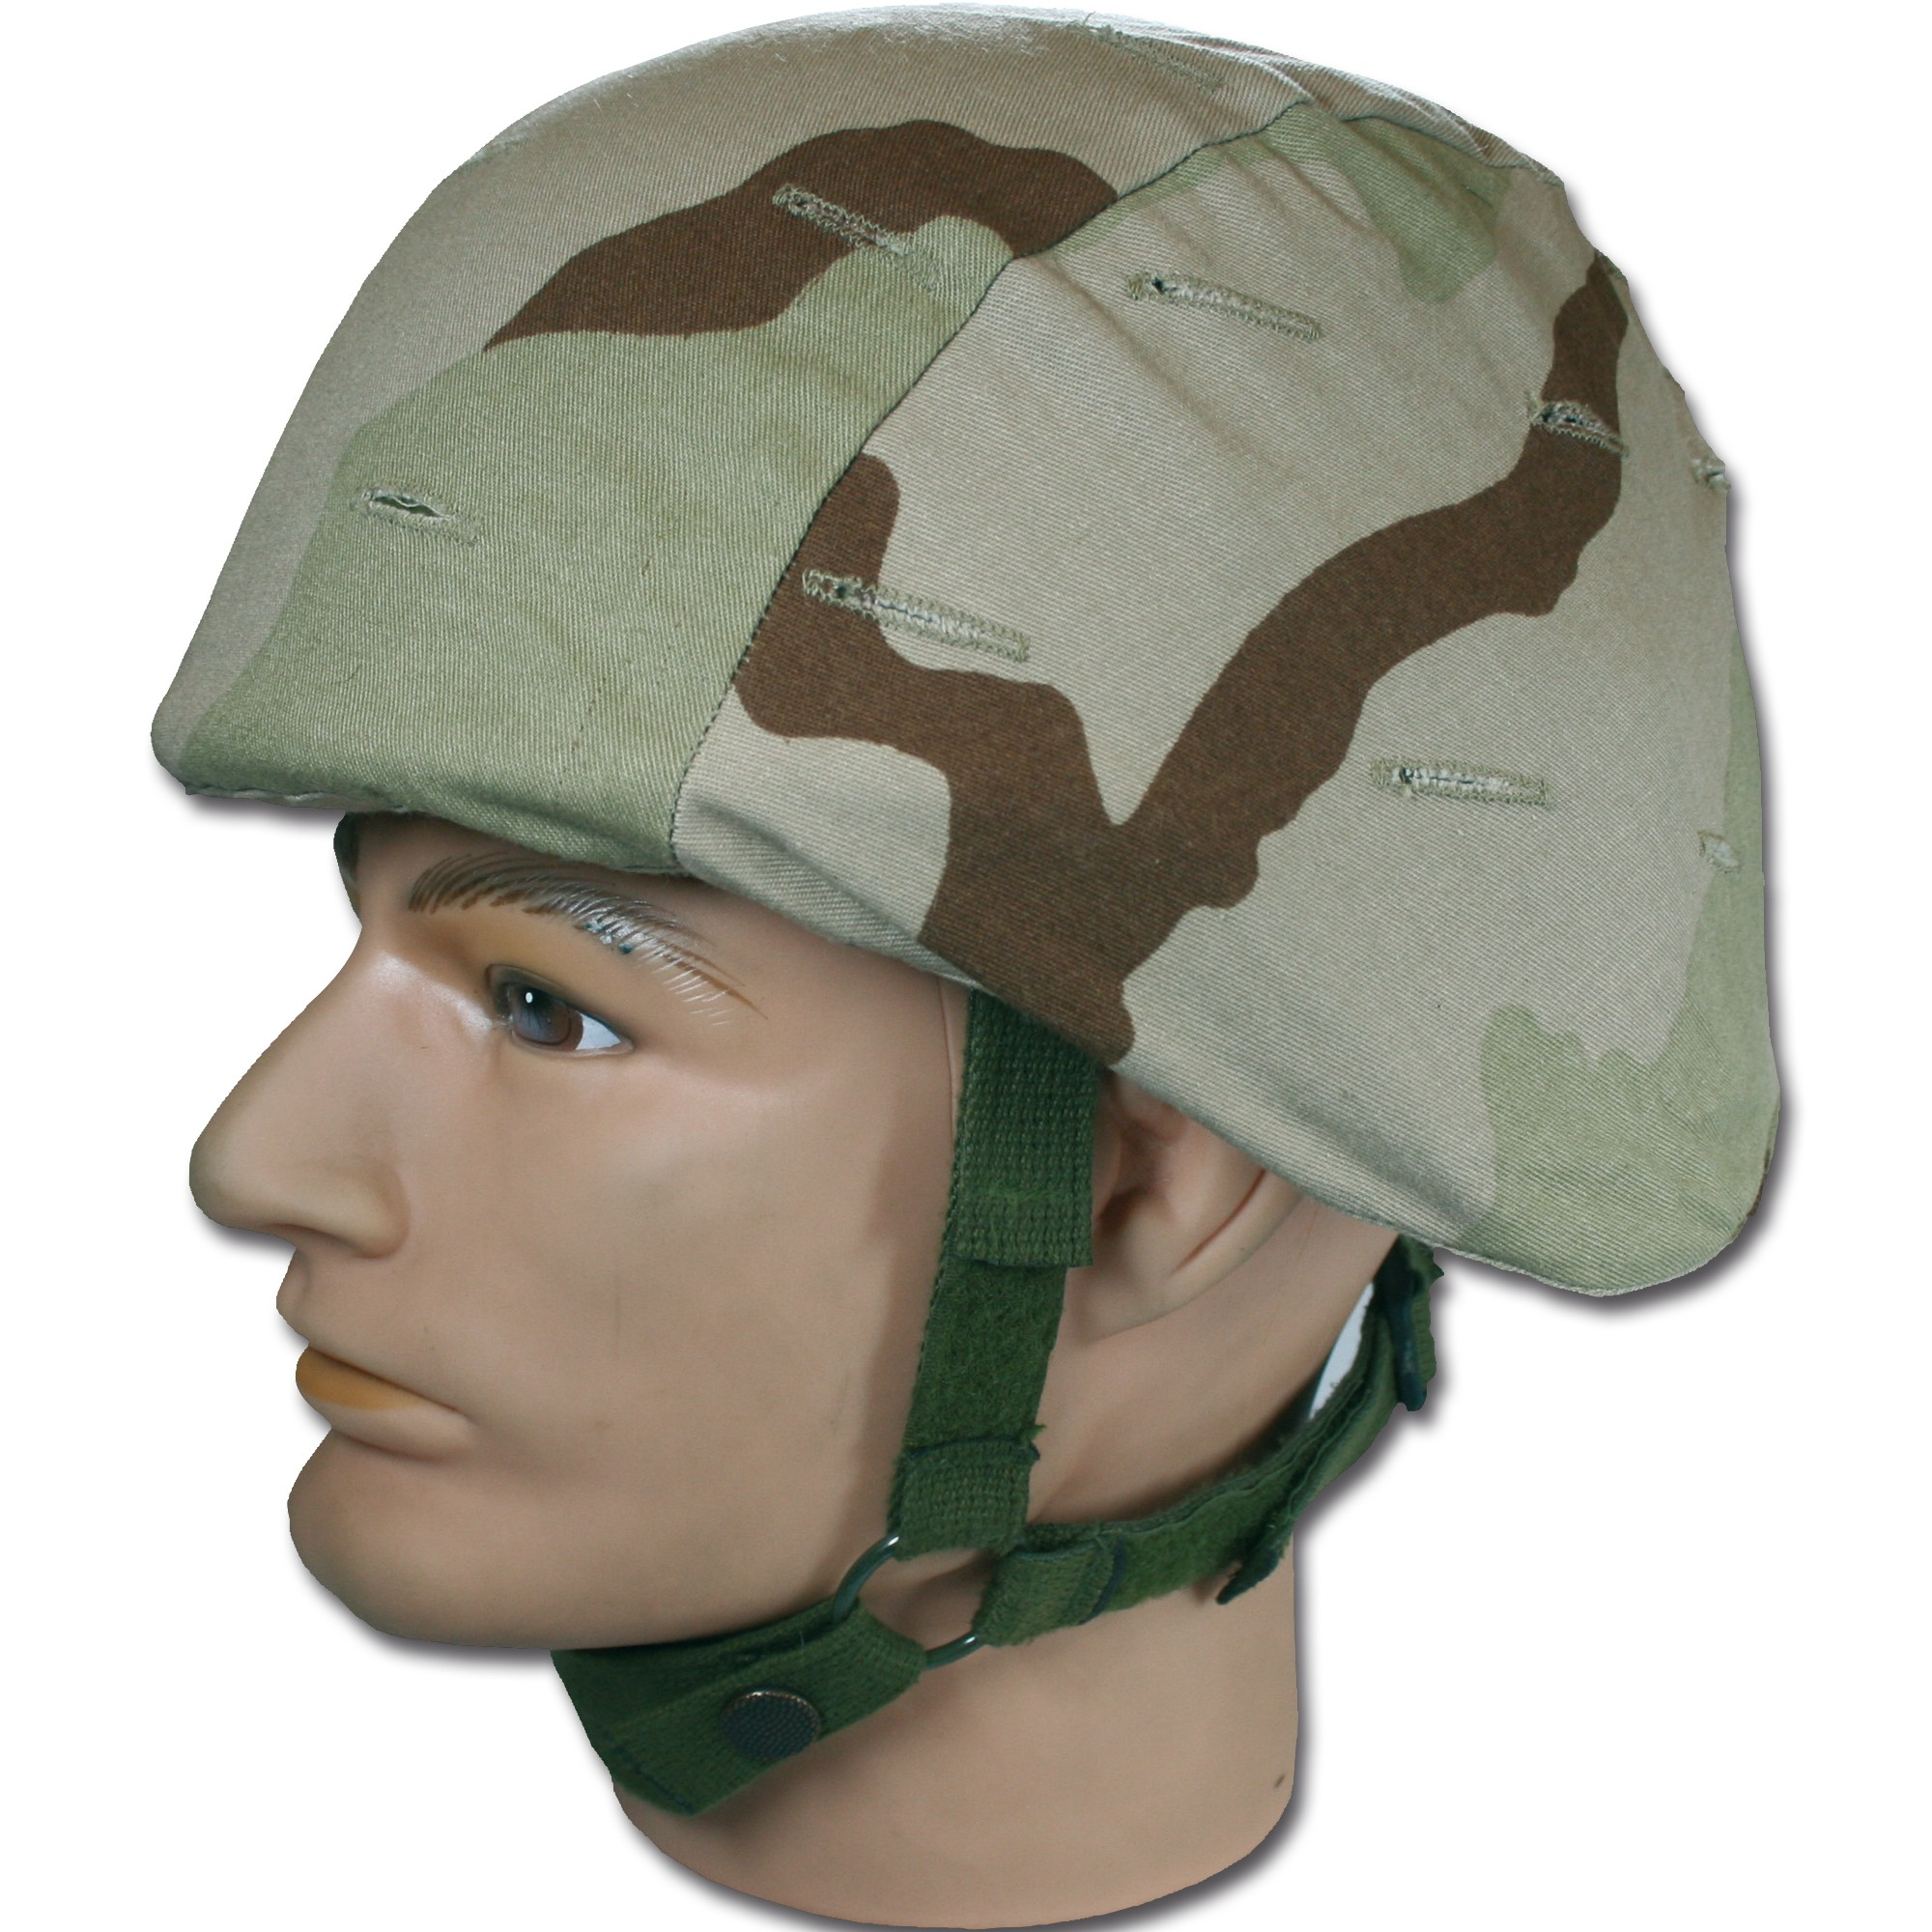 Helmbezug US Kevlar desert 3-color